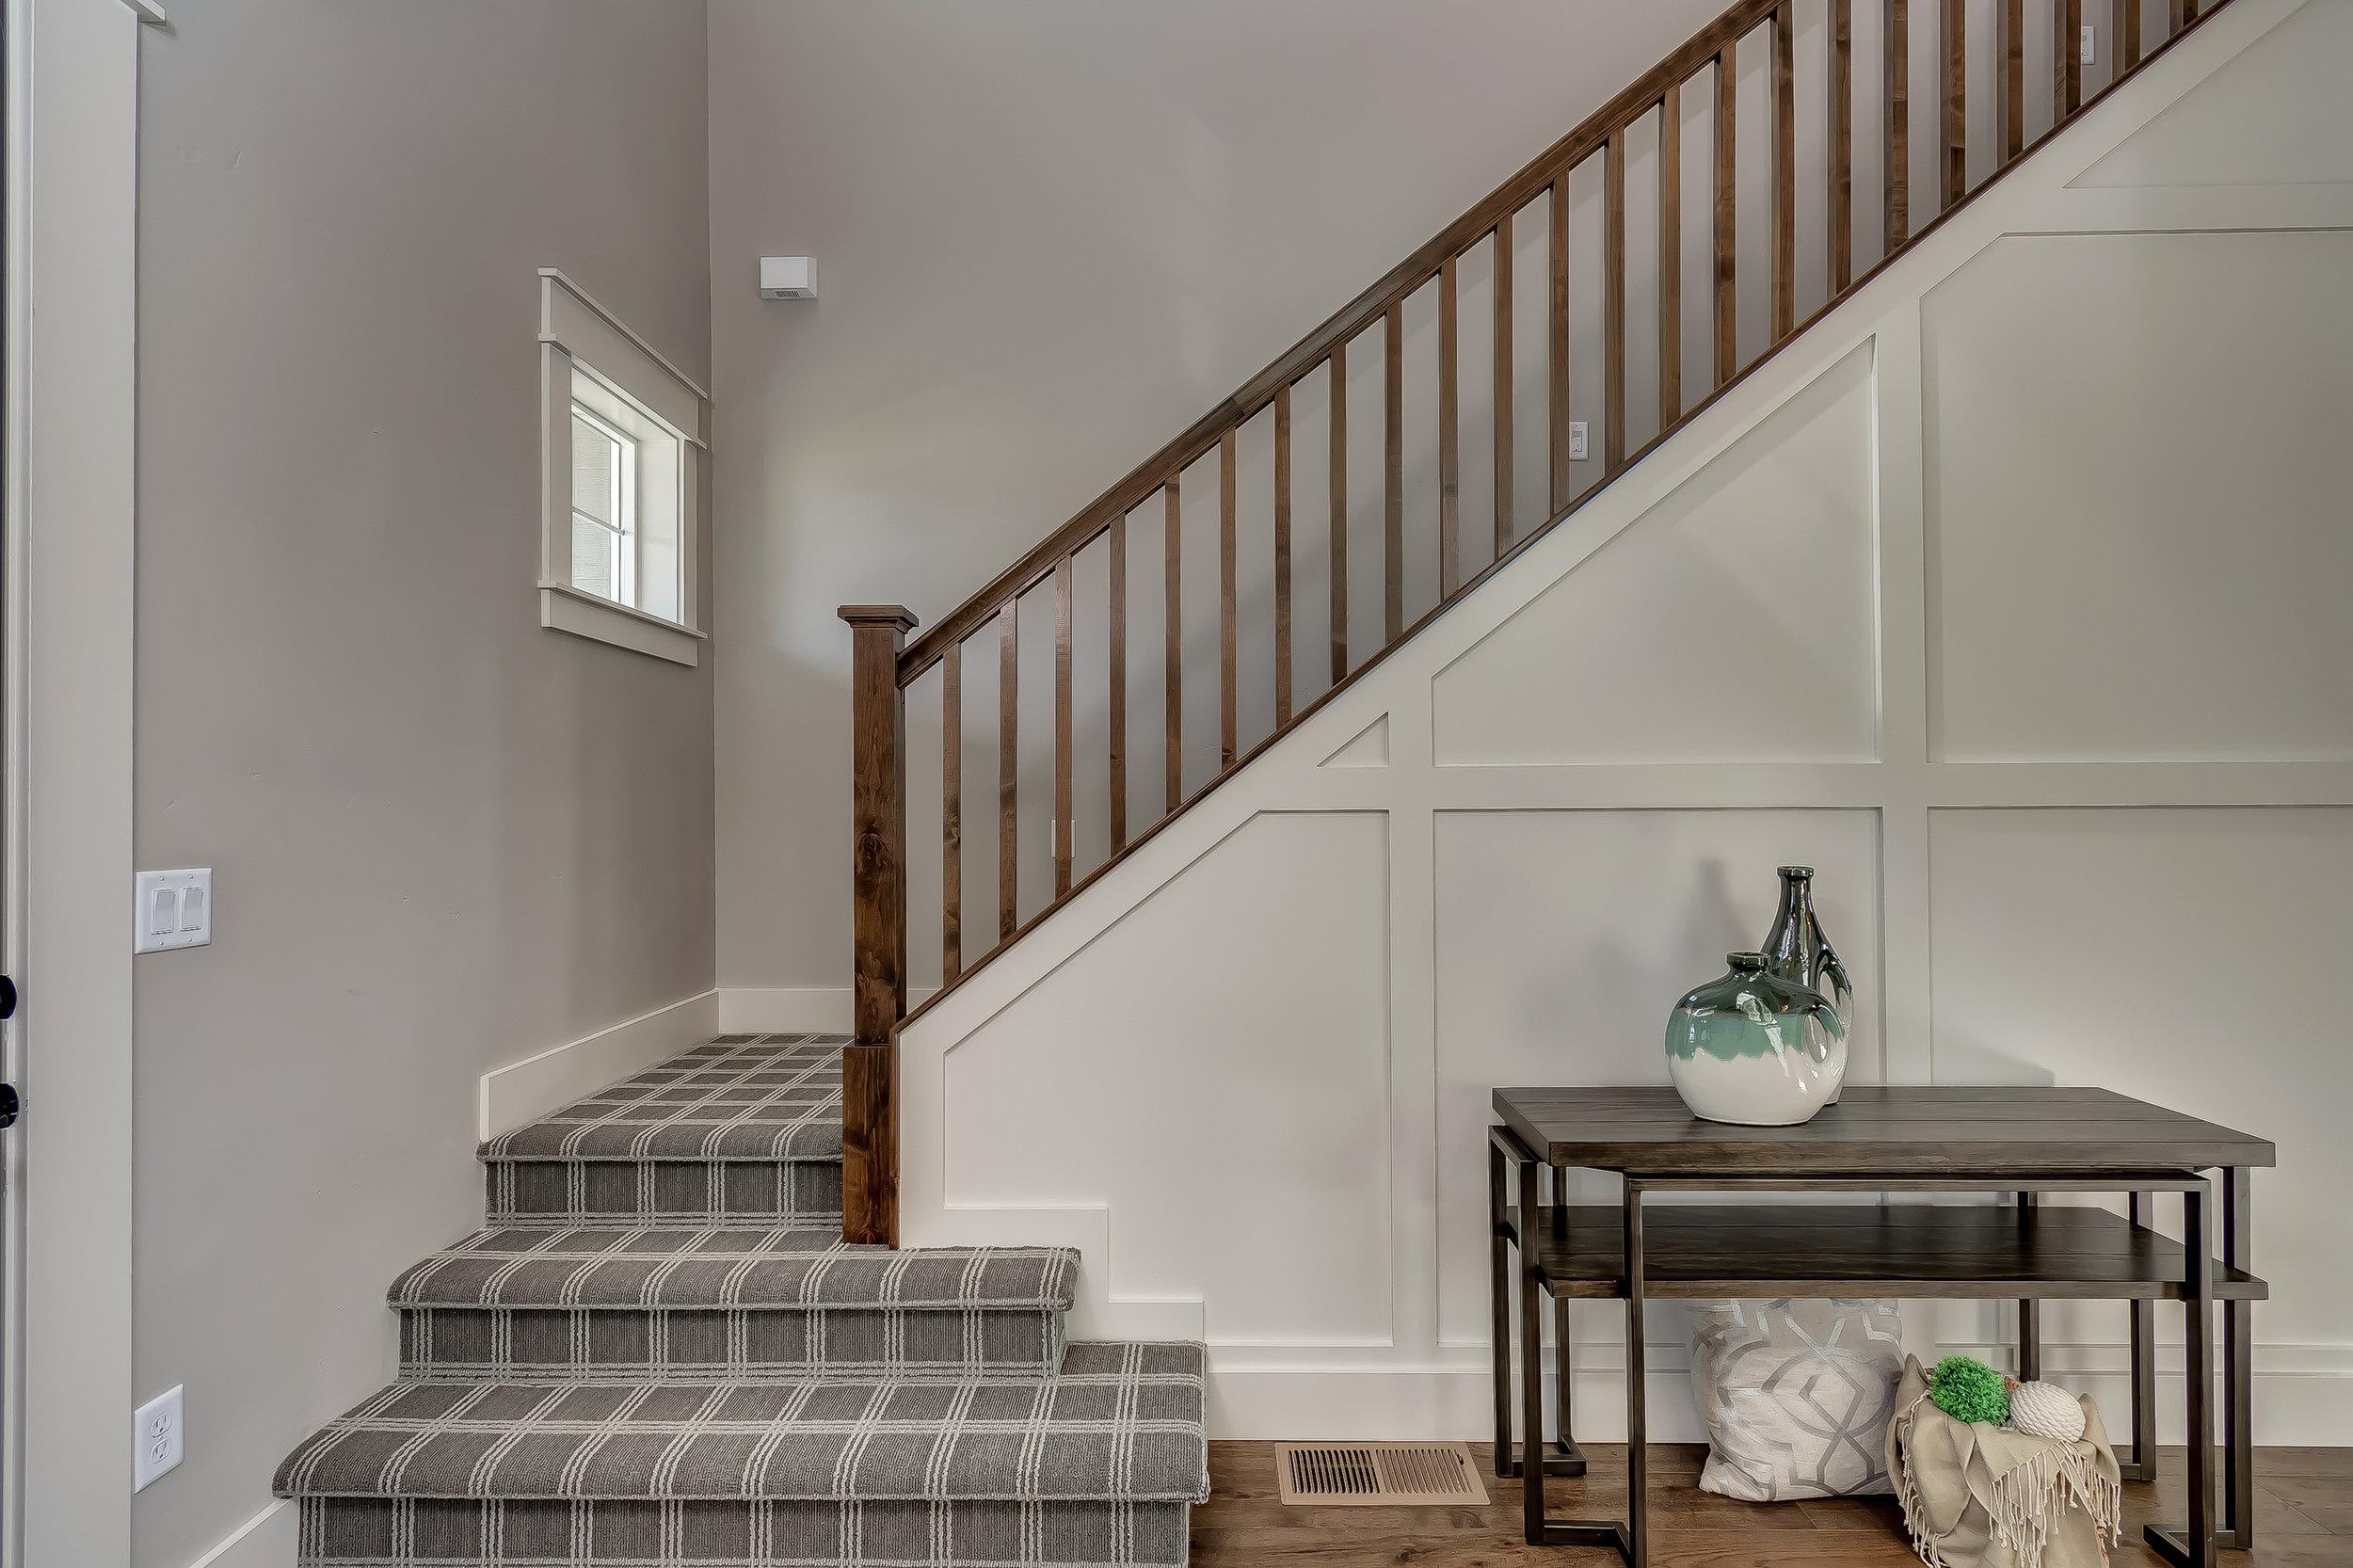 012_Staircase .jpg